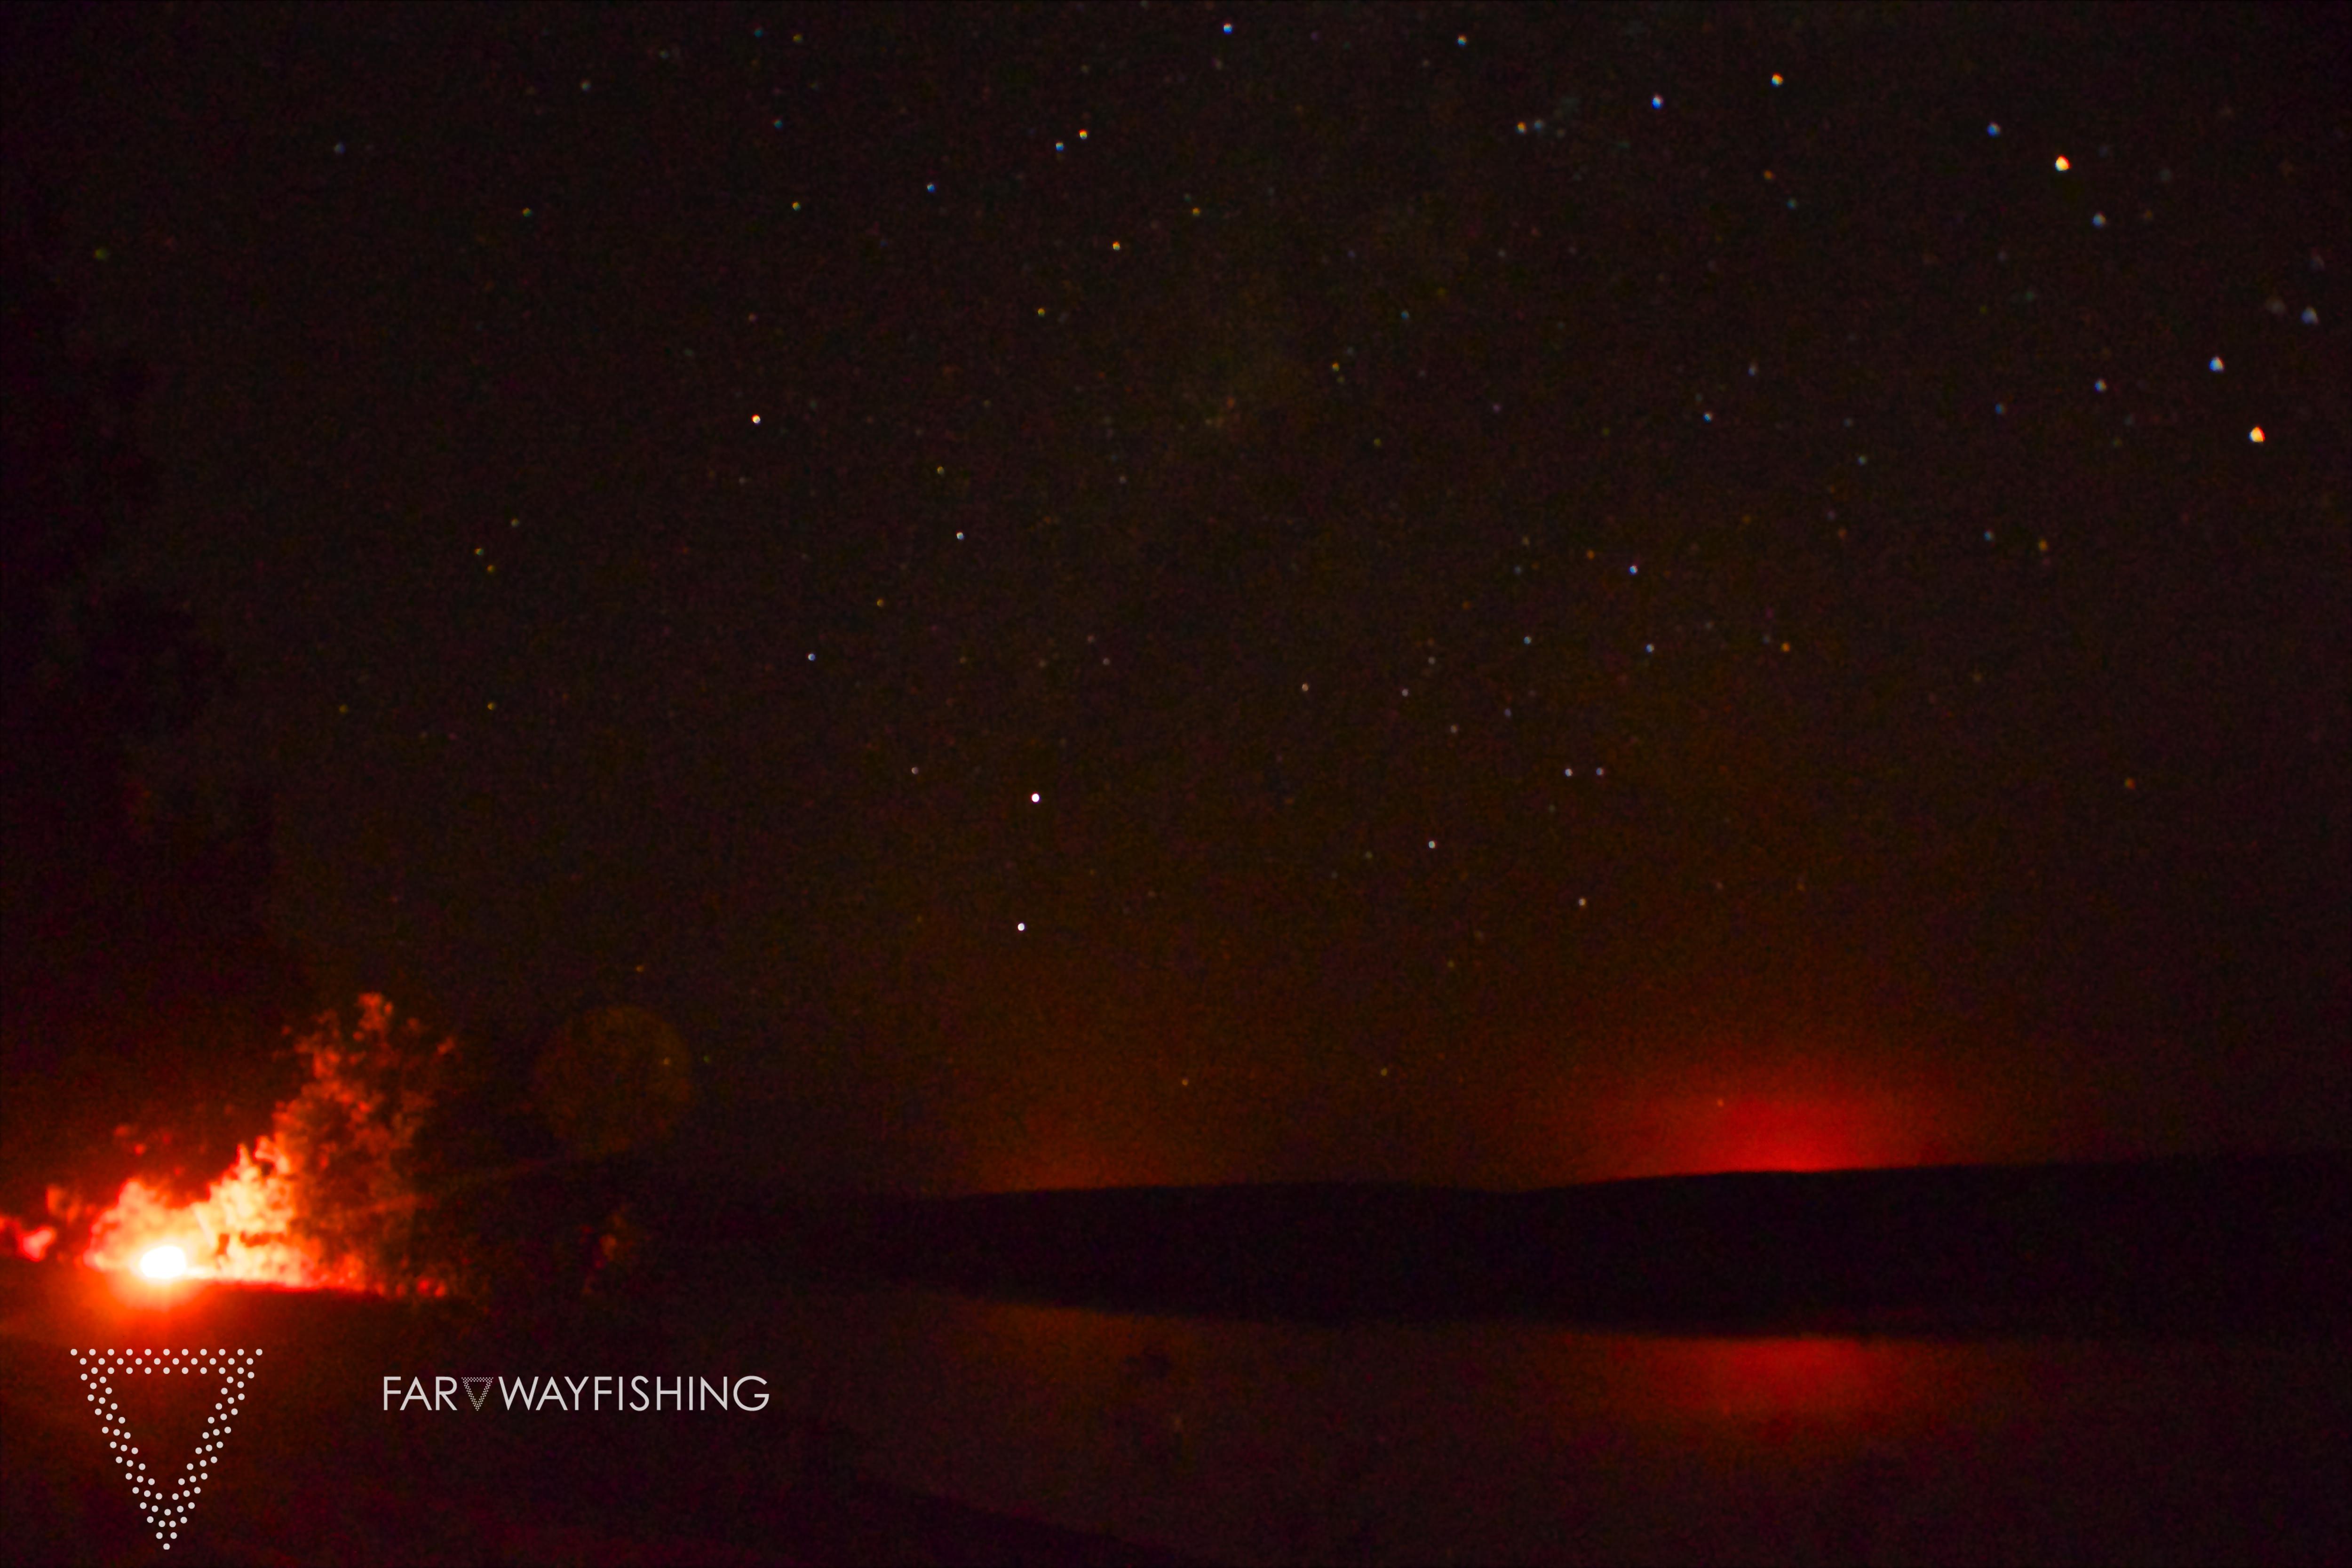 IMG_3543Penecost nightscape